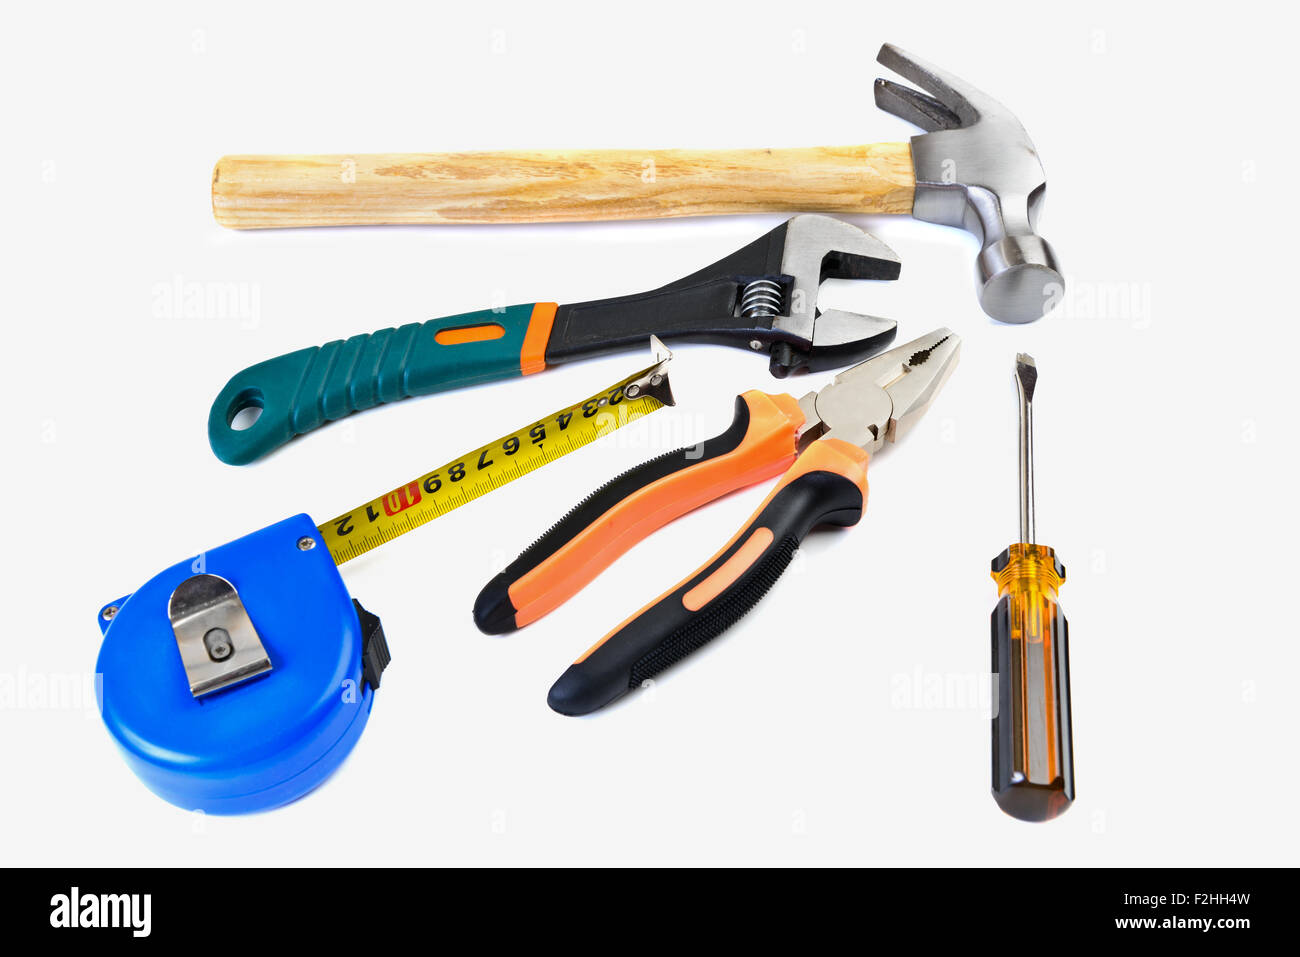 set tool isolated on a white background - Stock Image